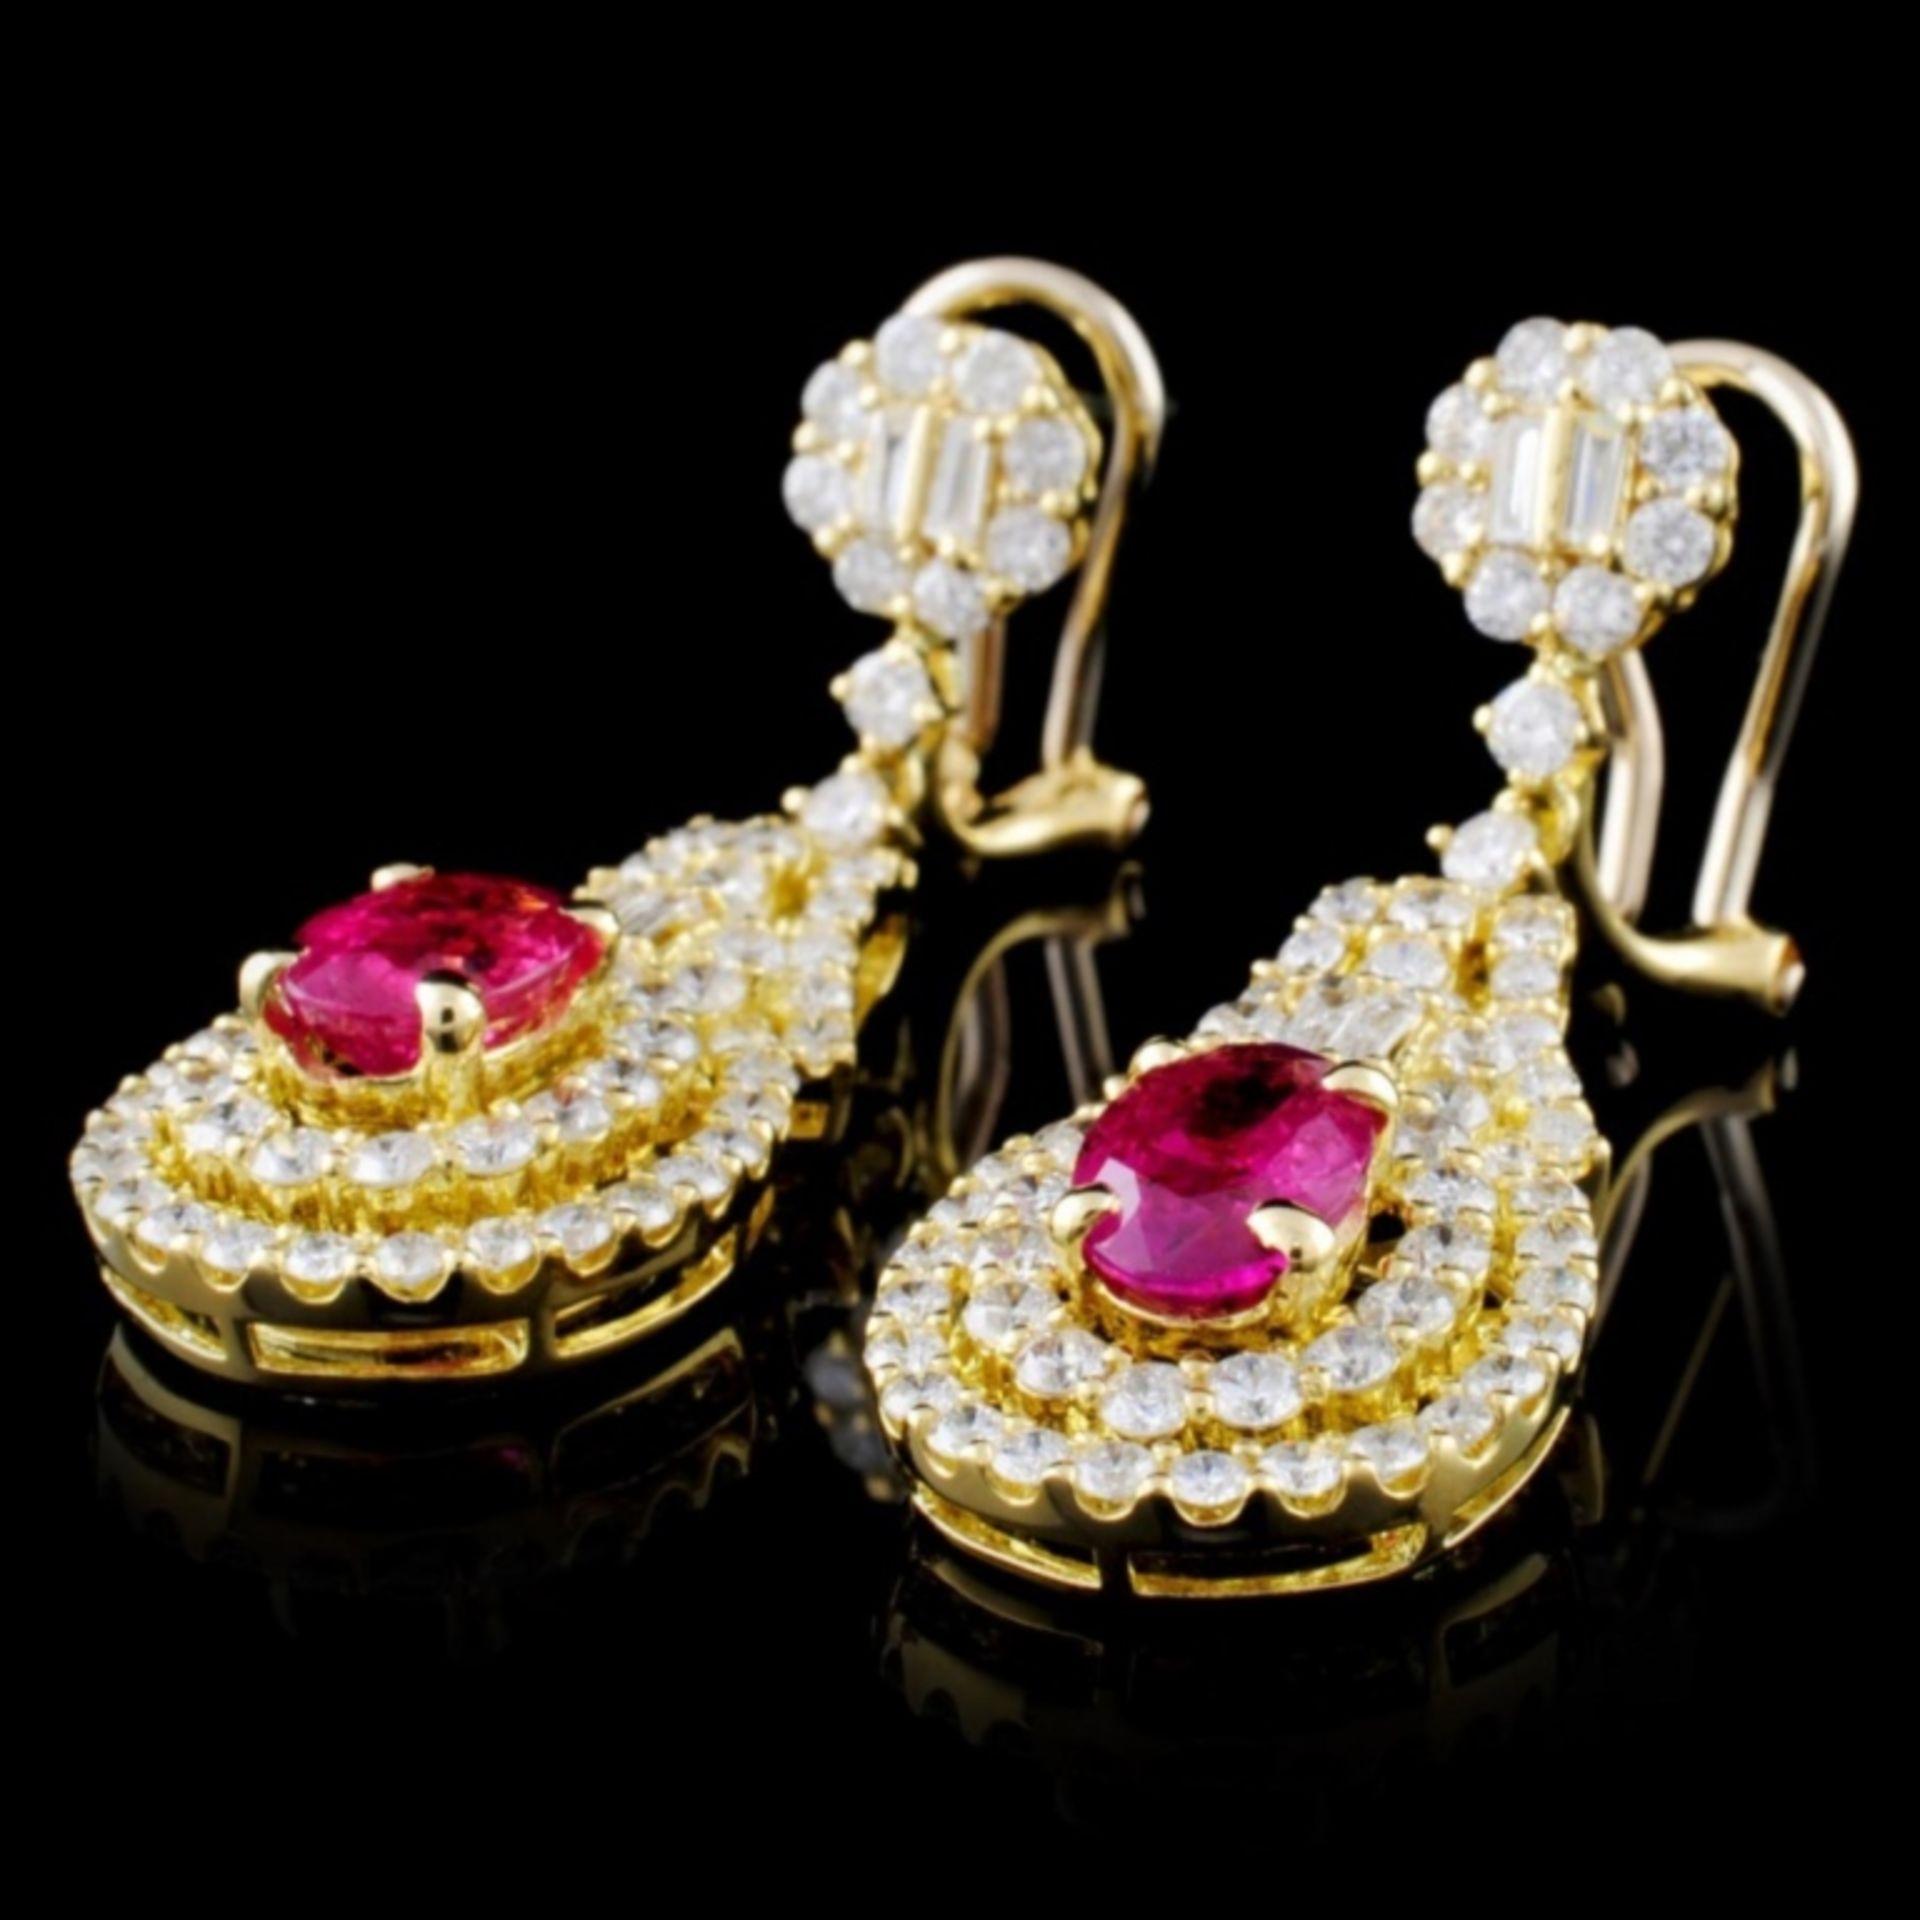 18K Gold 1.91ctw Ruby & 2.52ctw Diamond Earrings - Image 2 of 3